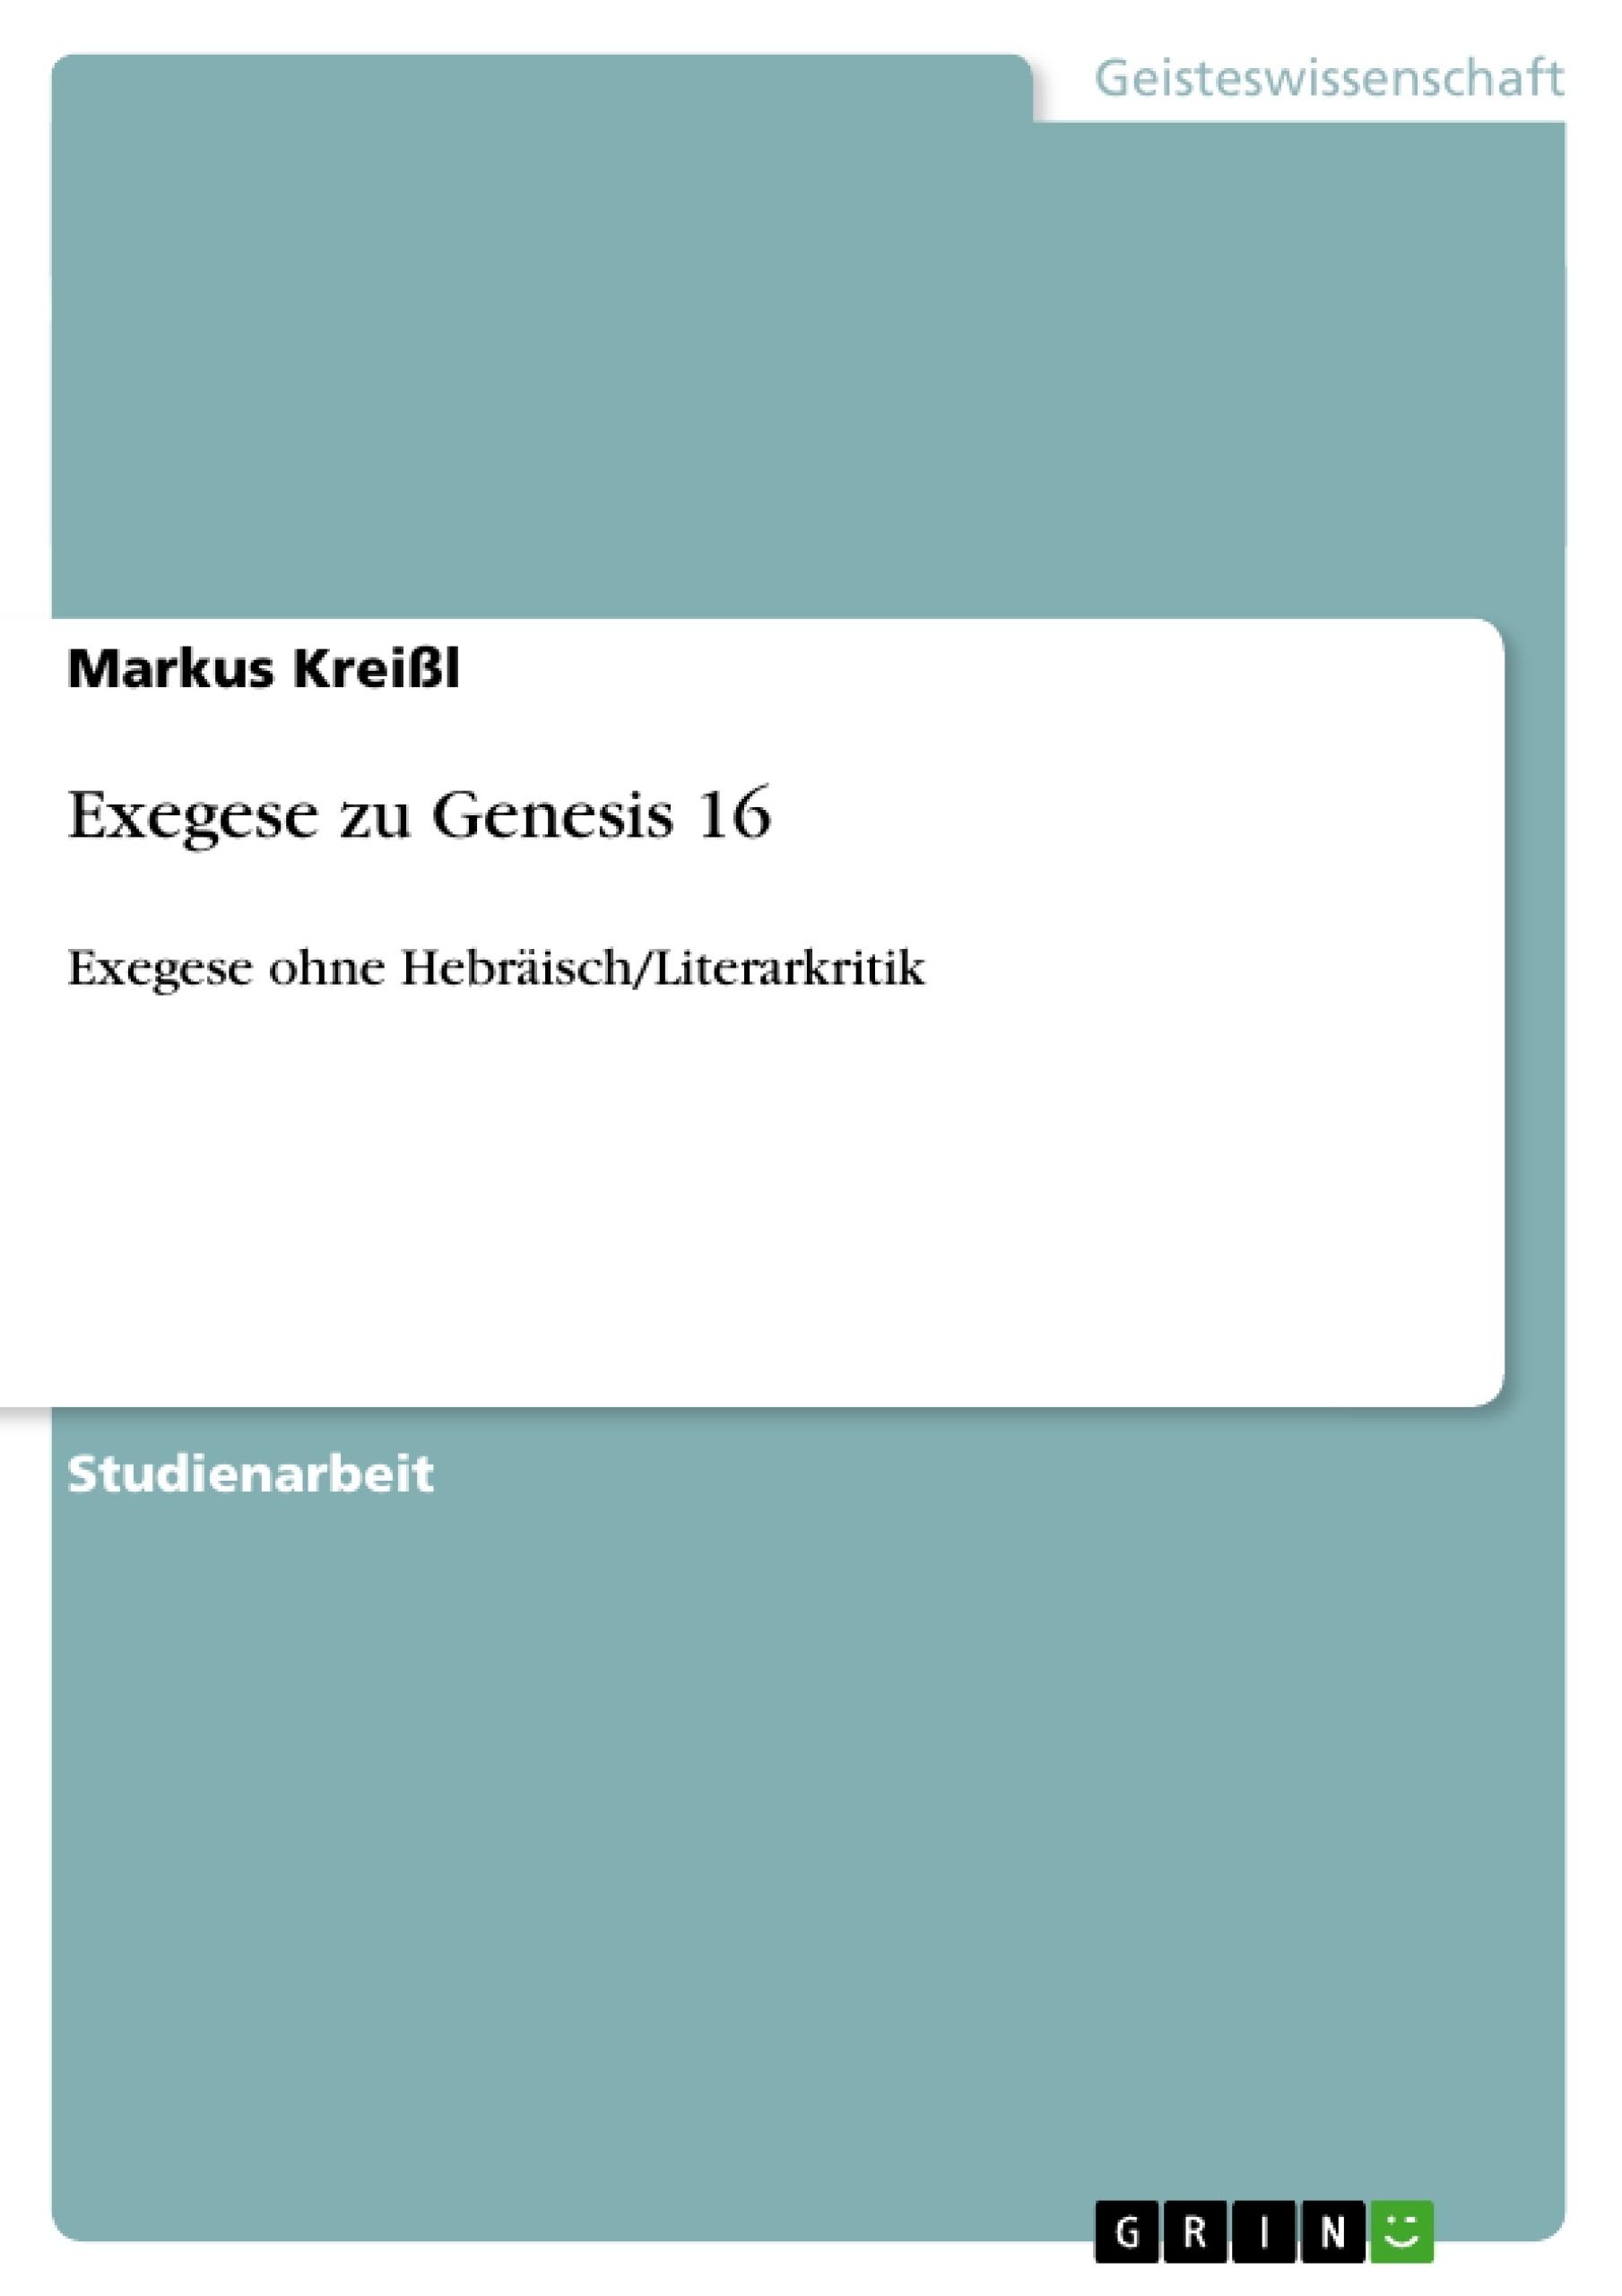 Titel: Exegese zu Genesis 16